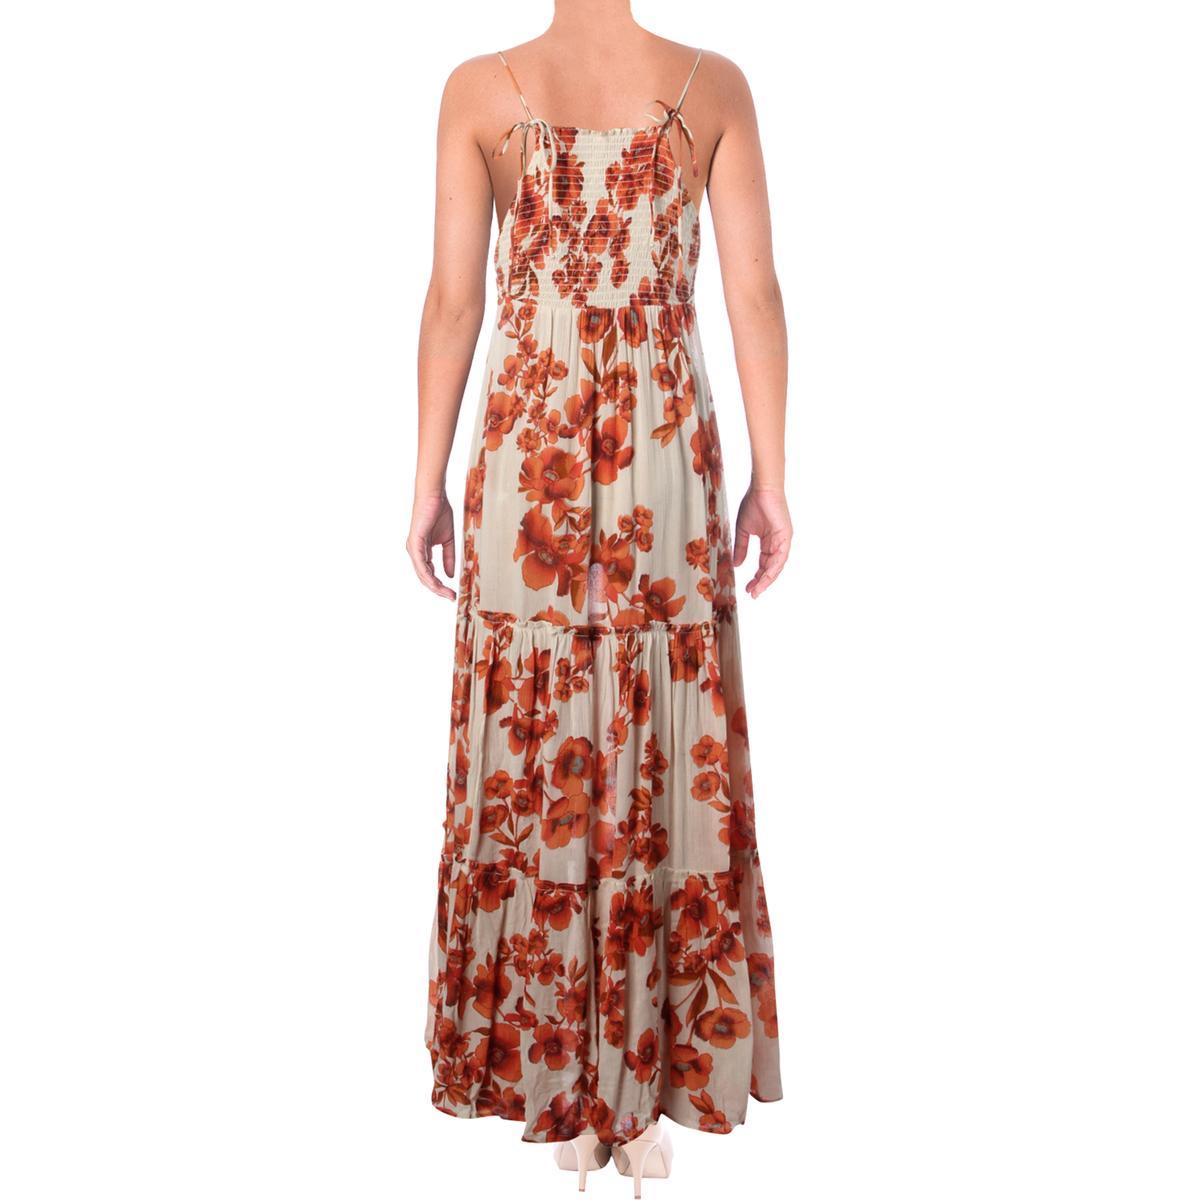 4c25cd1d8ef Free People Womens Floral Print Sleeveless Full-Length Maxi Dress ...